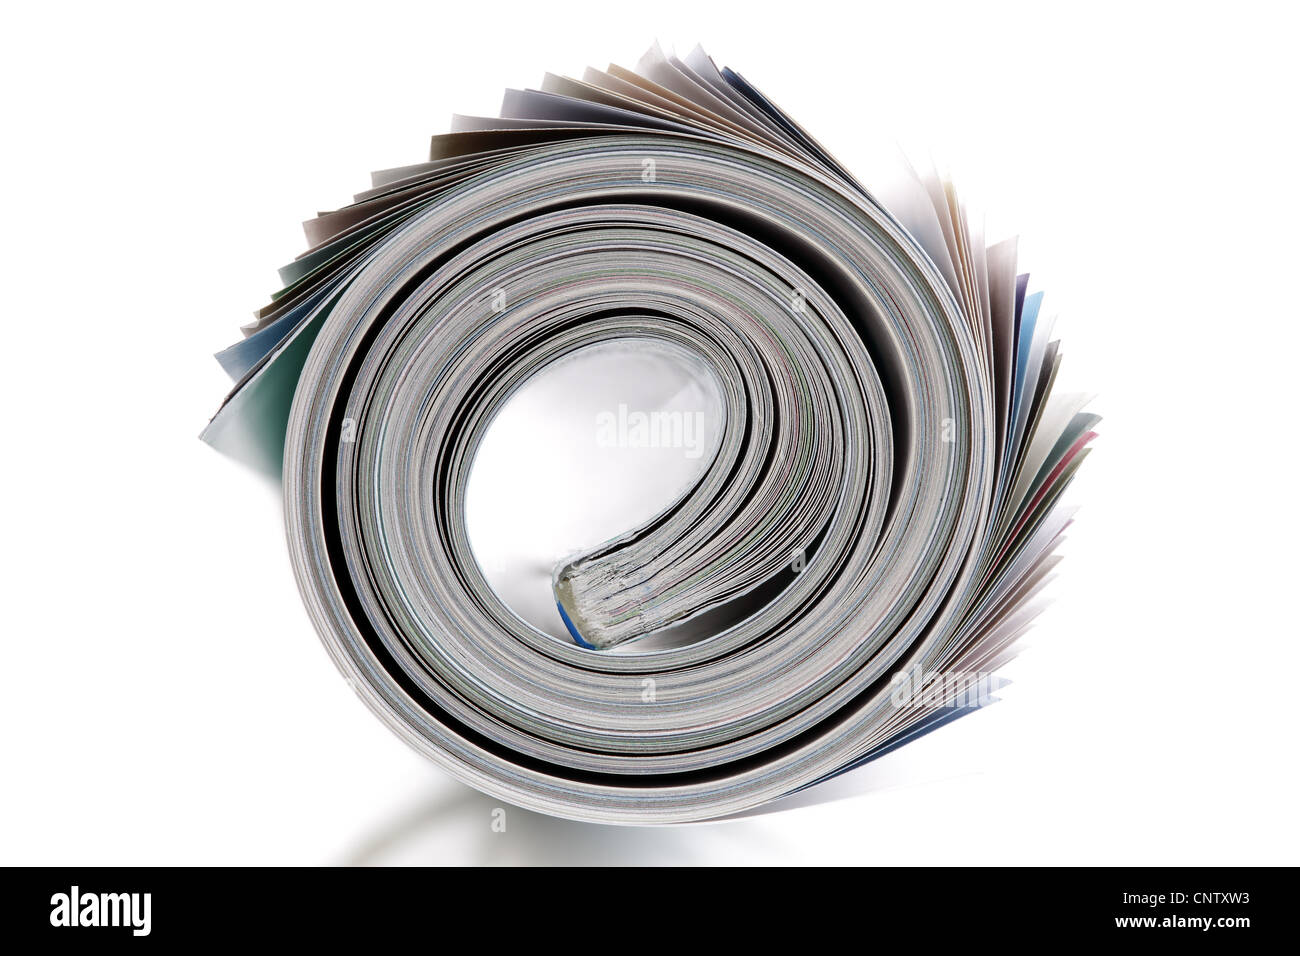 Magazine roll - Stock Image